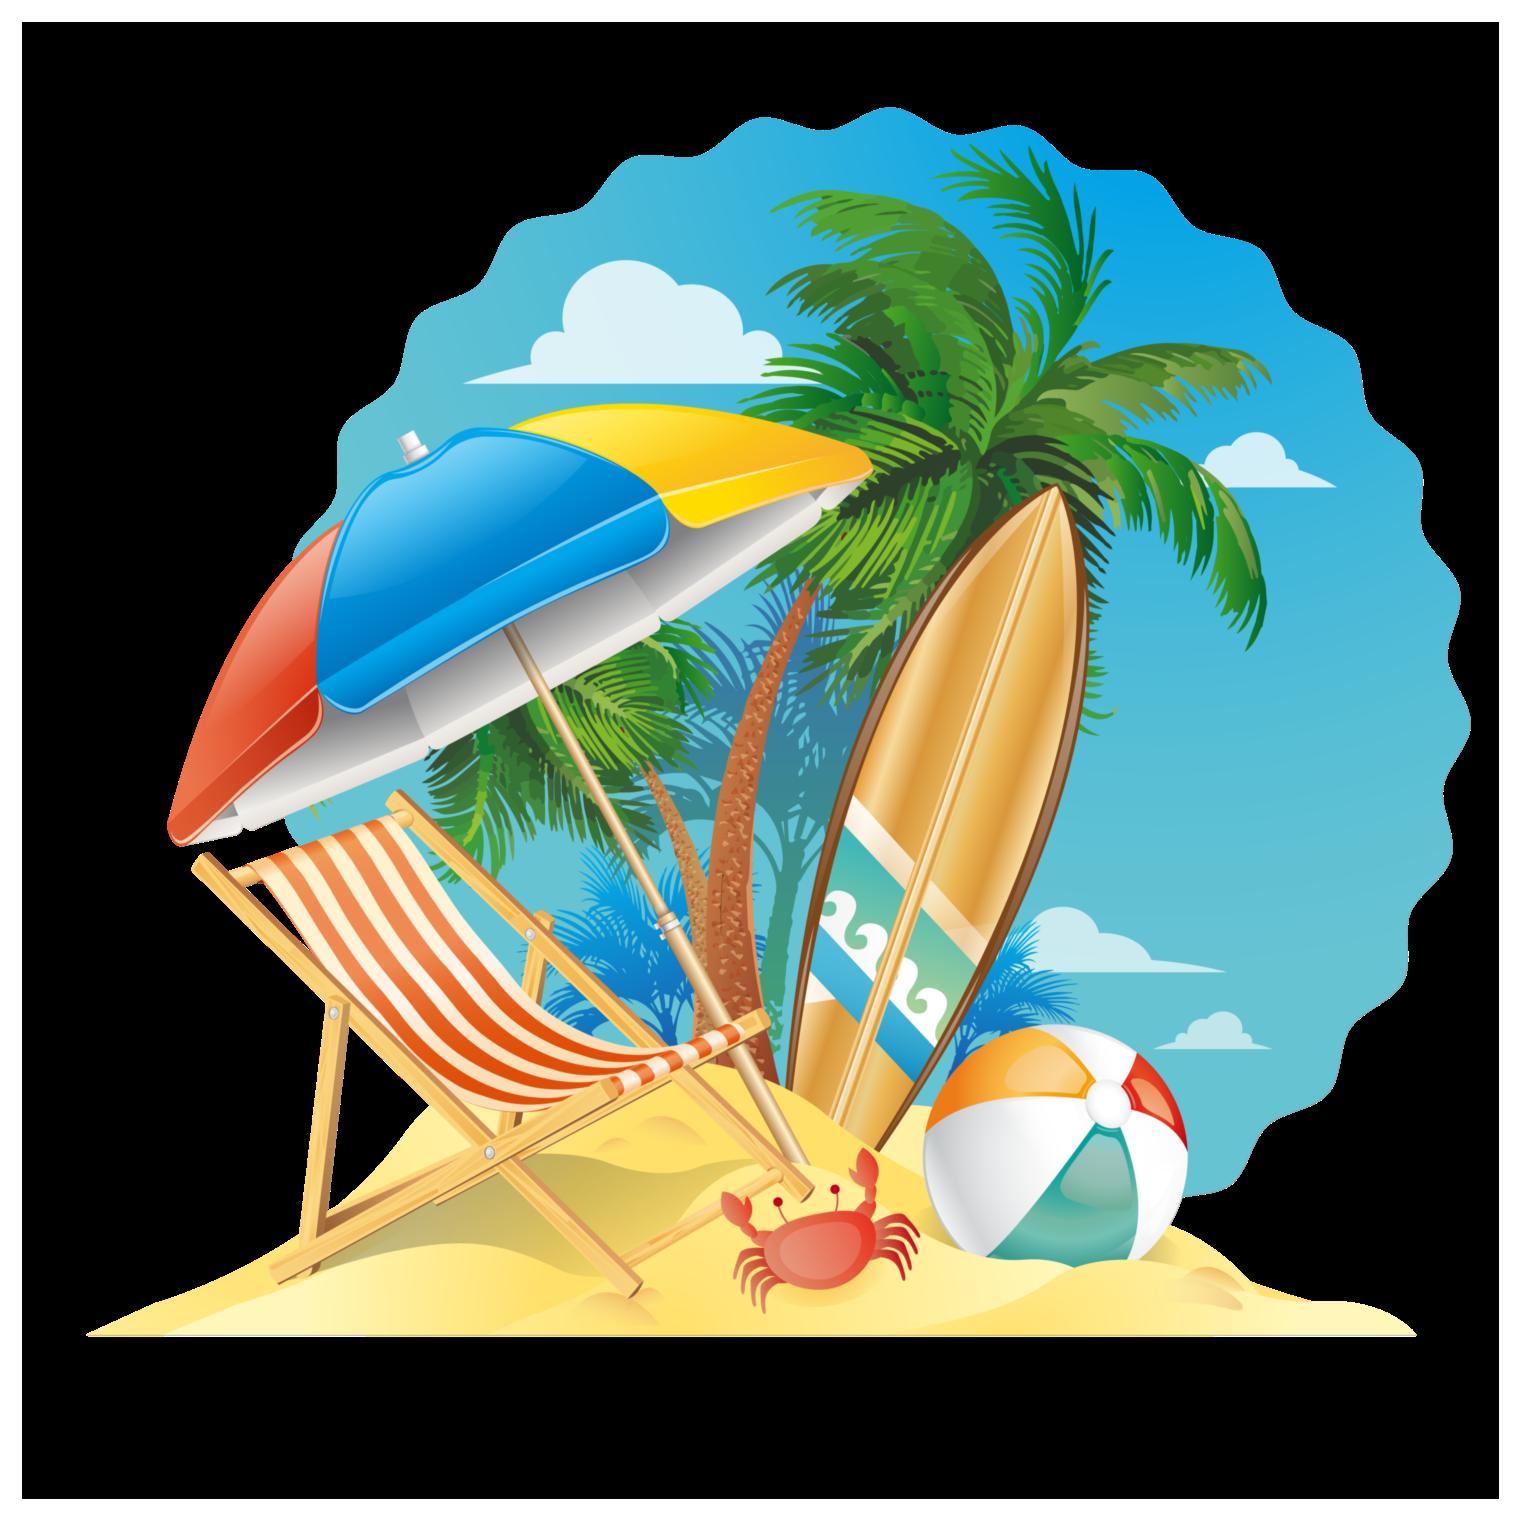 Summer beach scene clipart png library Summer Beach Scene Window Cling png library